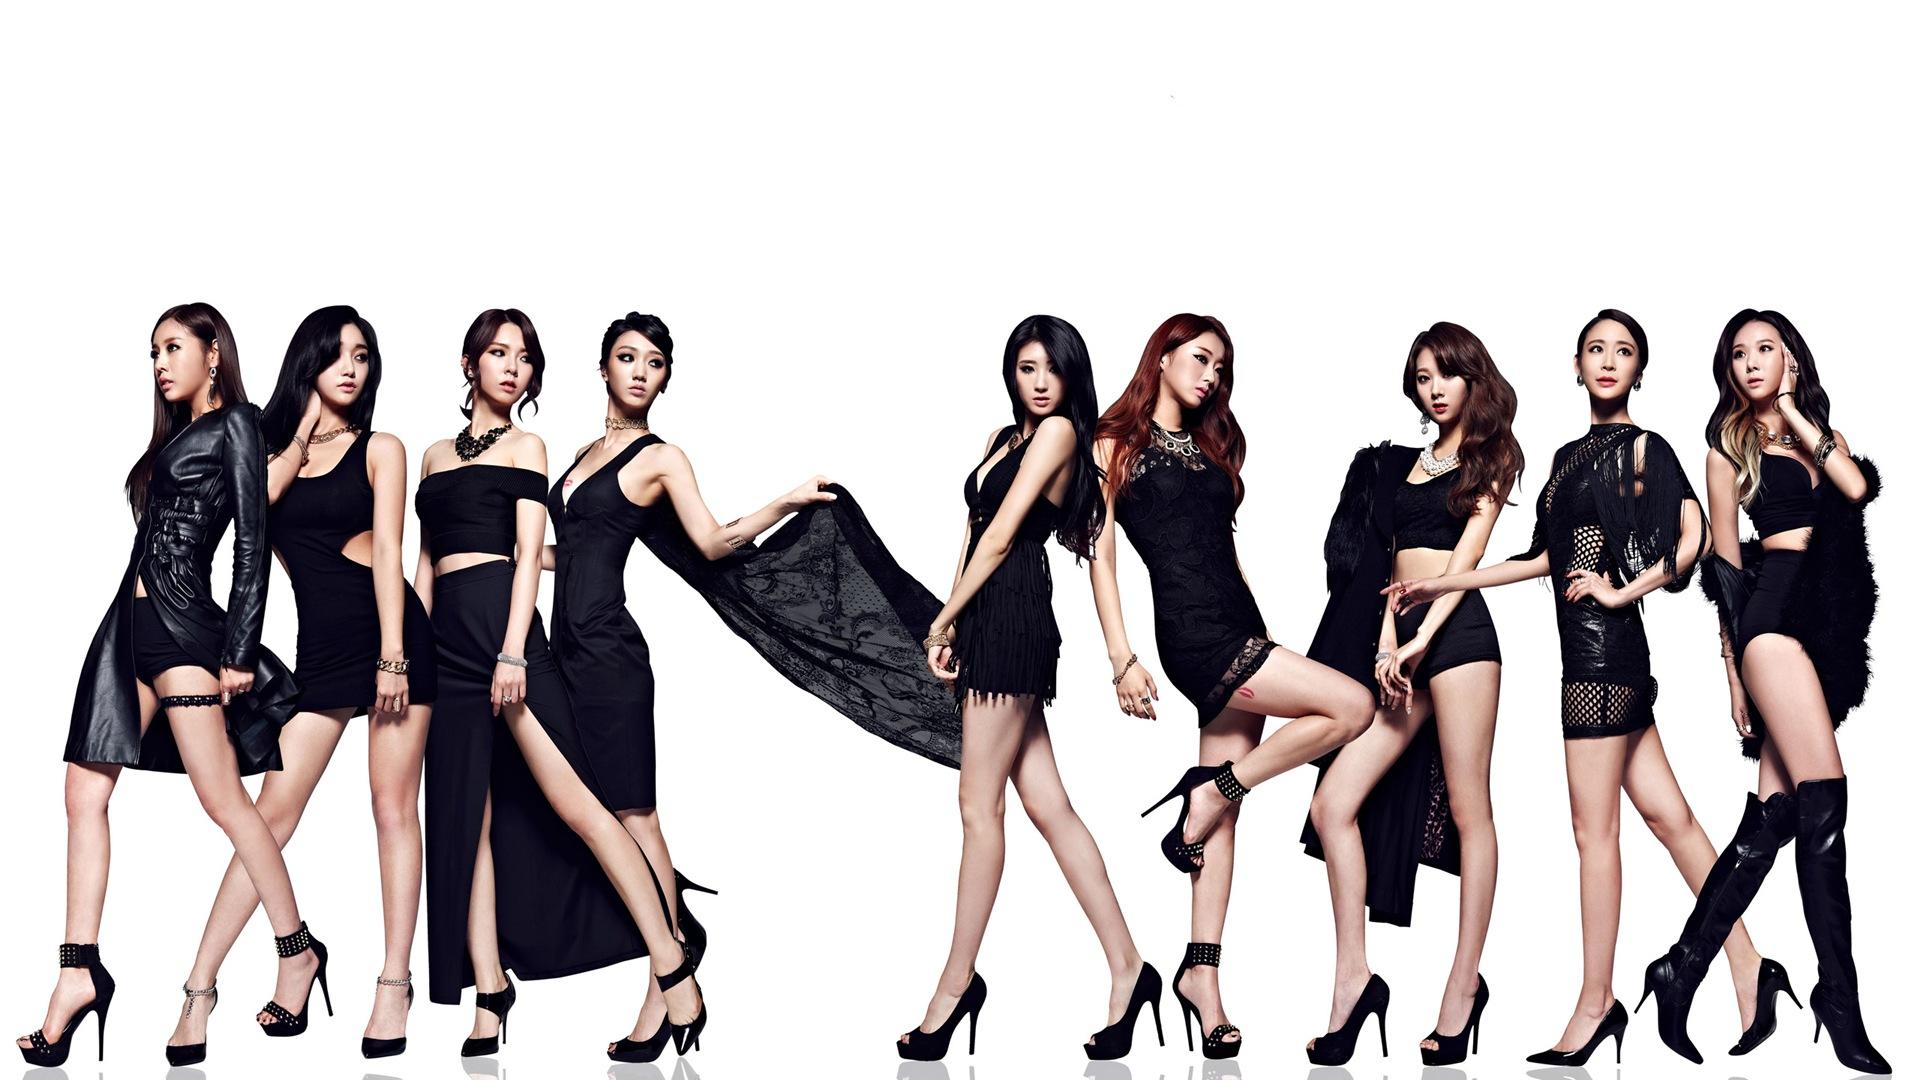 Korean Girl group Nine Muses HD Wallpapers #19 - 1920x1080